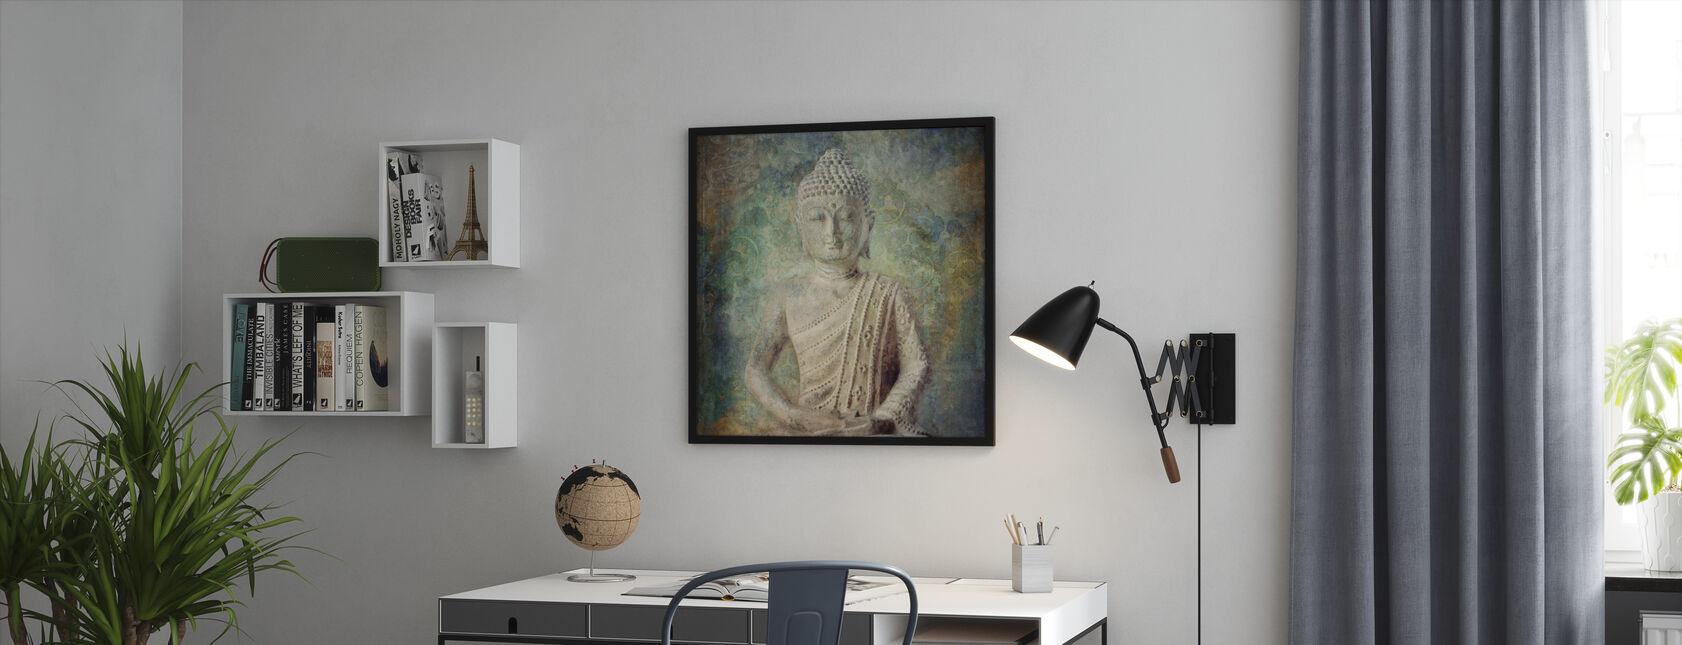 Ruhiger Buddha Quadriert - Gerahmtes bild - Büro